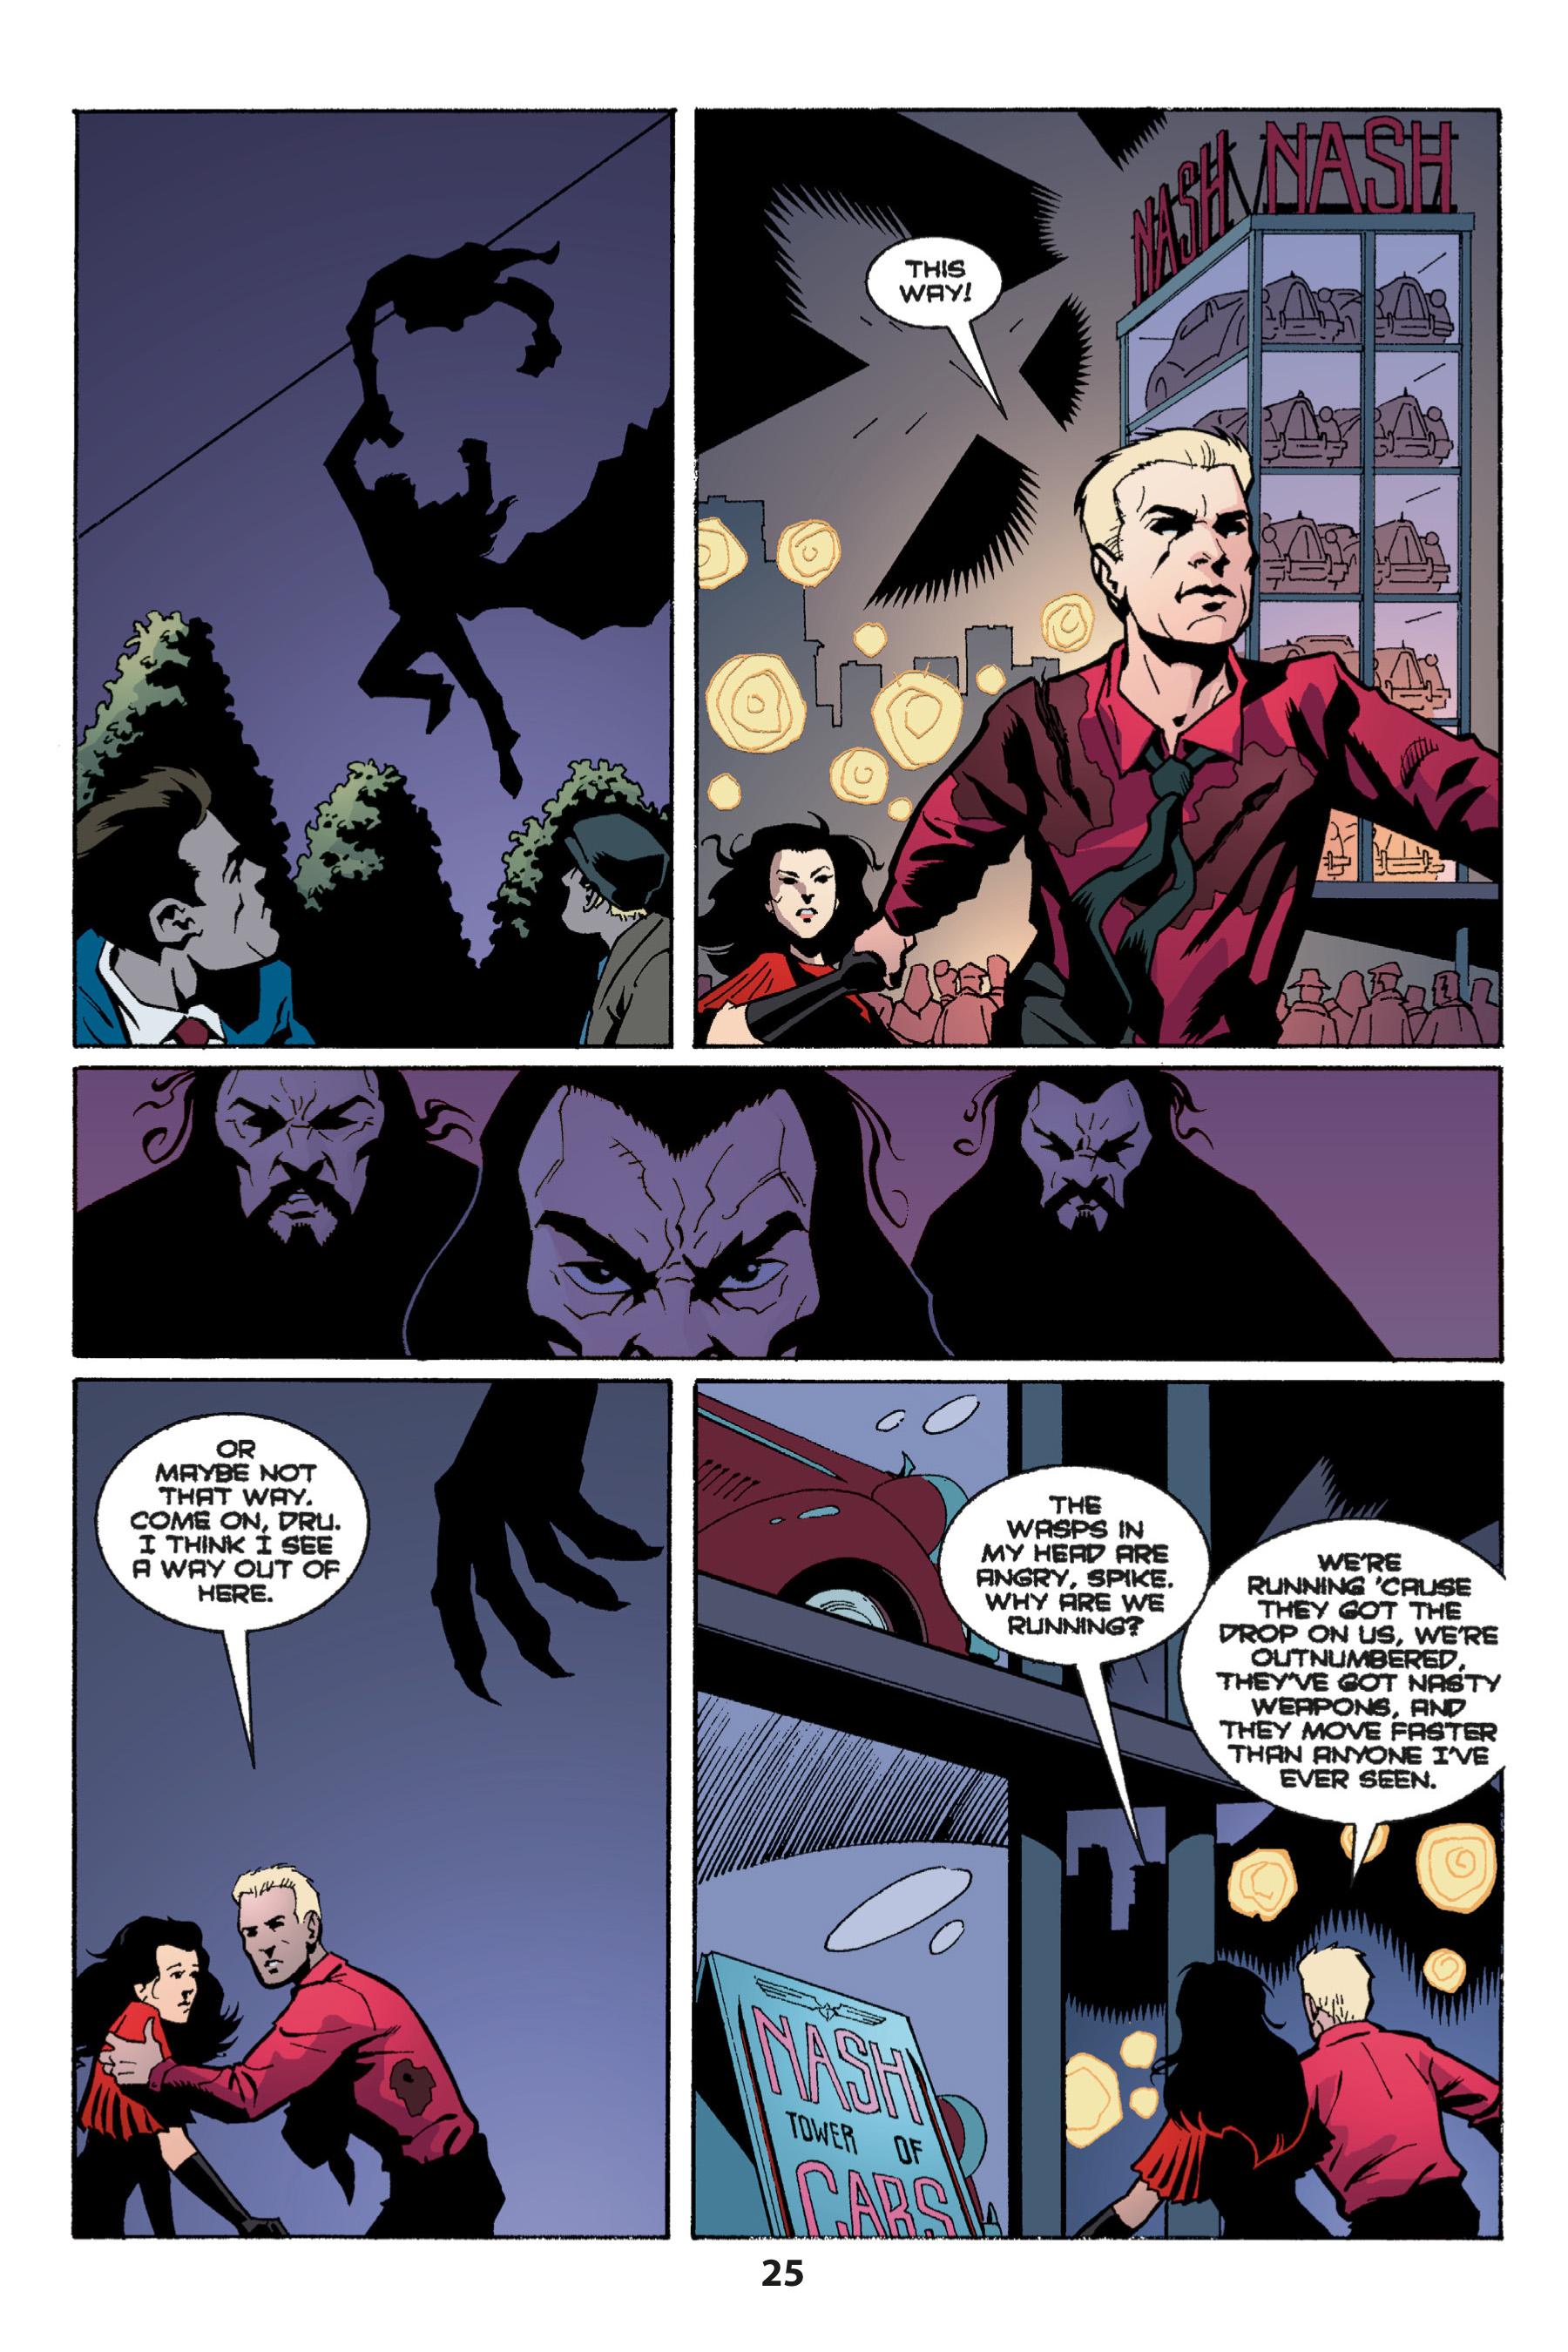 Read online Buffy the Vampire Slayer: Omnibus comic -  Issue # TPB 1 - 27